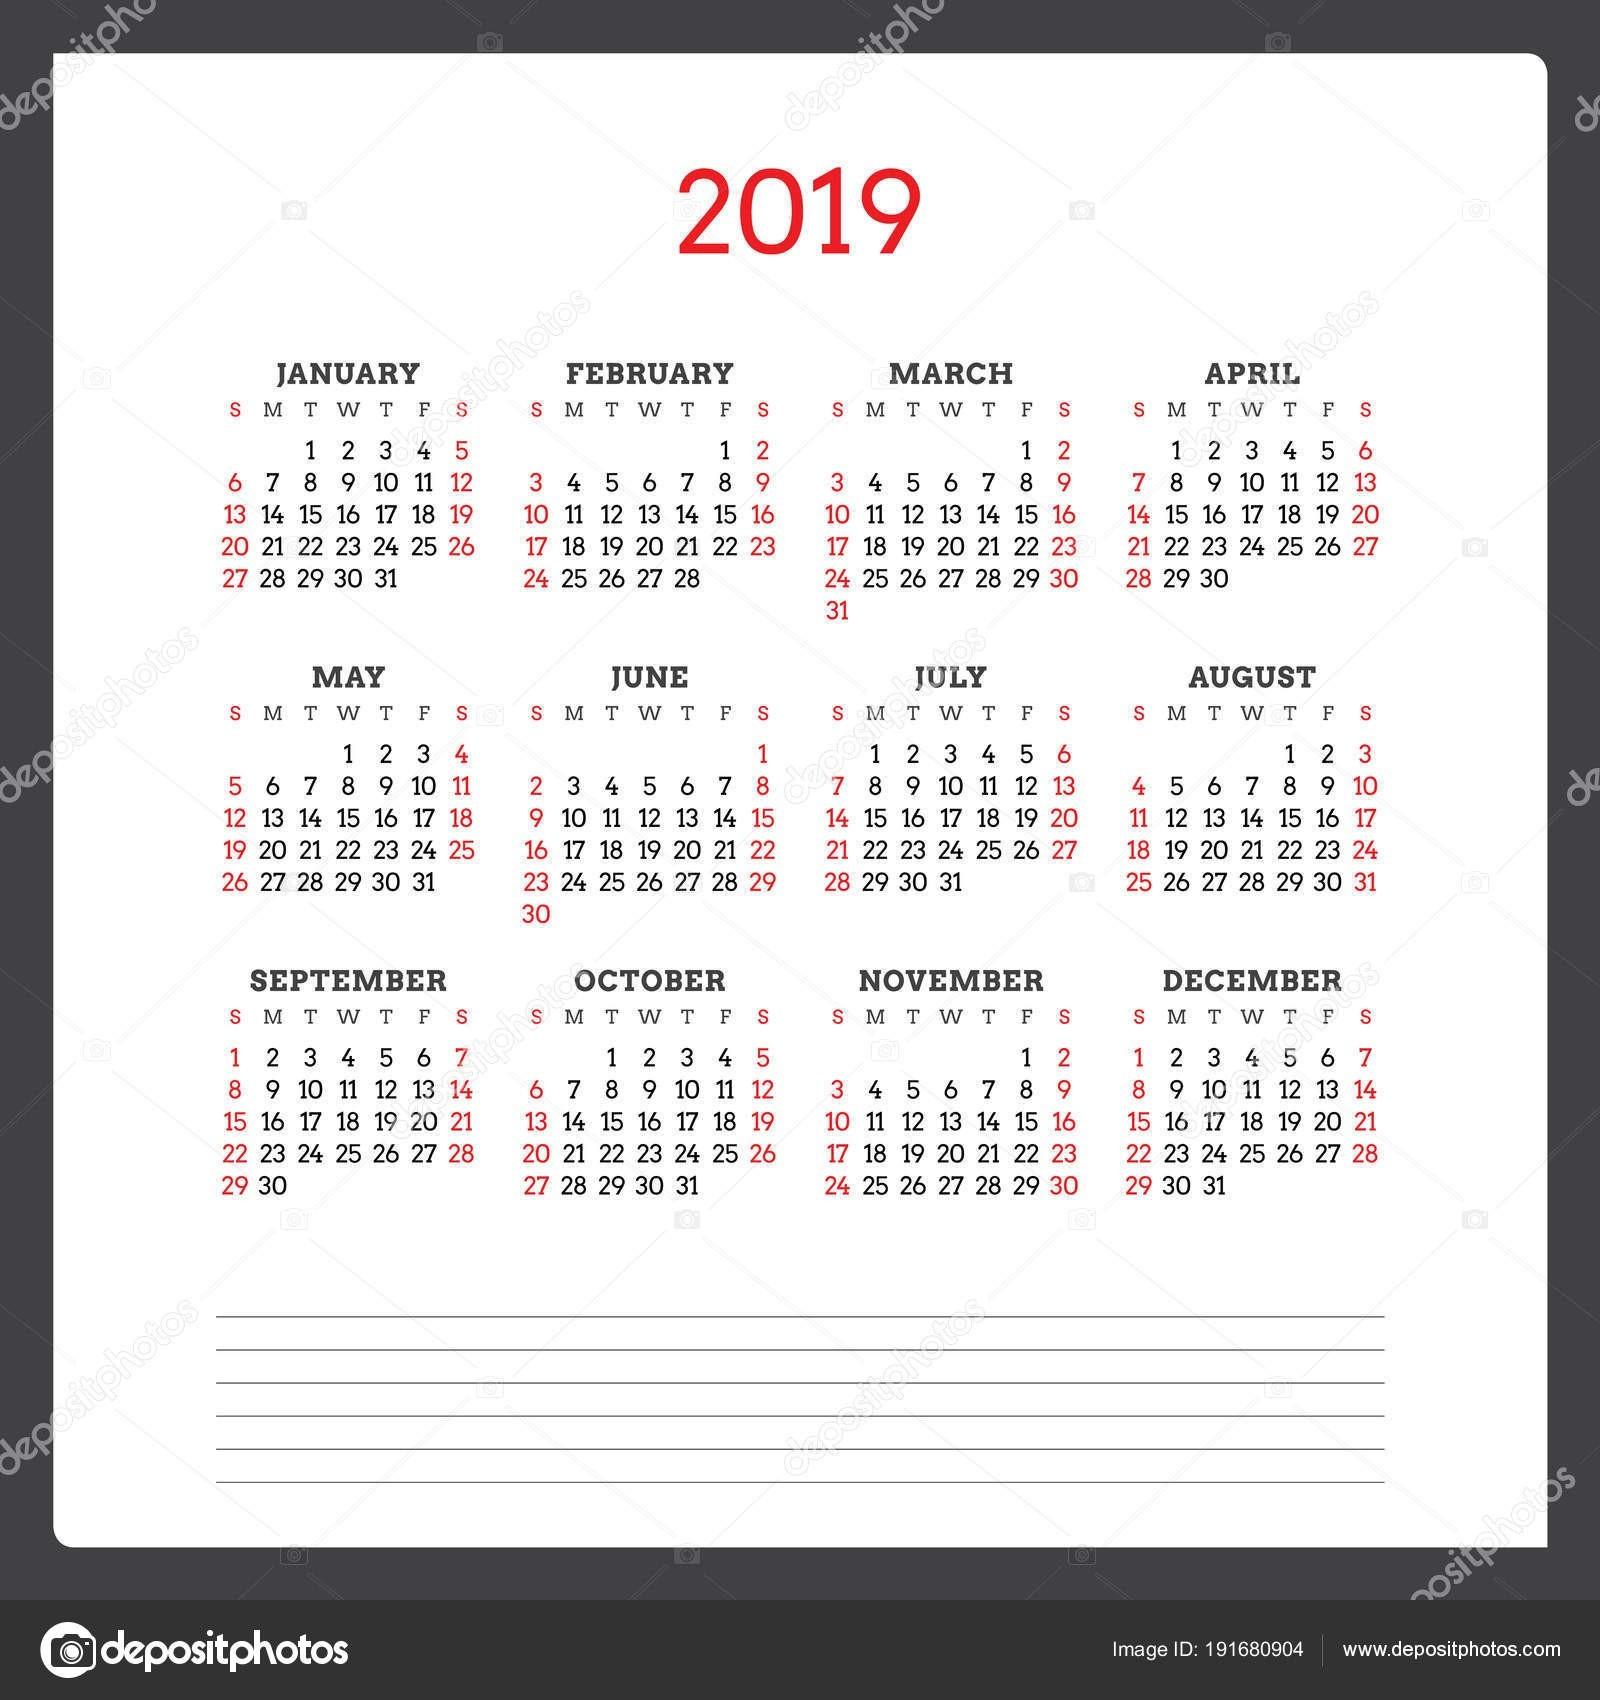 Calendario Lunar Febrero 2019 Mexico Más Caliente Noticias Calendario 2019 Para Imprimir Con Feriados Mexico Of Calendario Lunar Febrero 2019 Mexico Mejores Y Más Novedosos Calaméo Gara